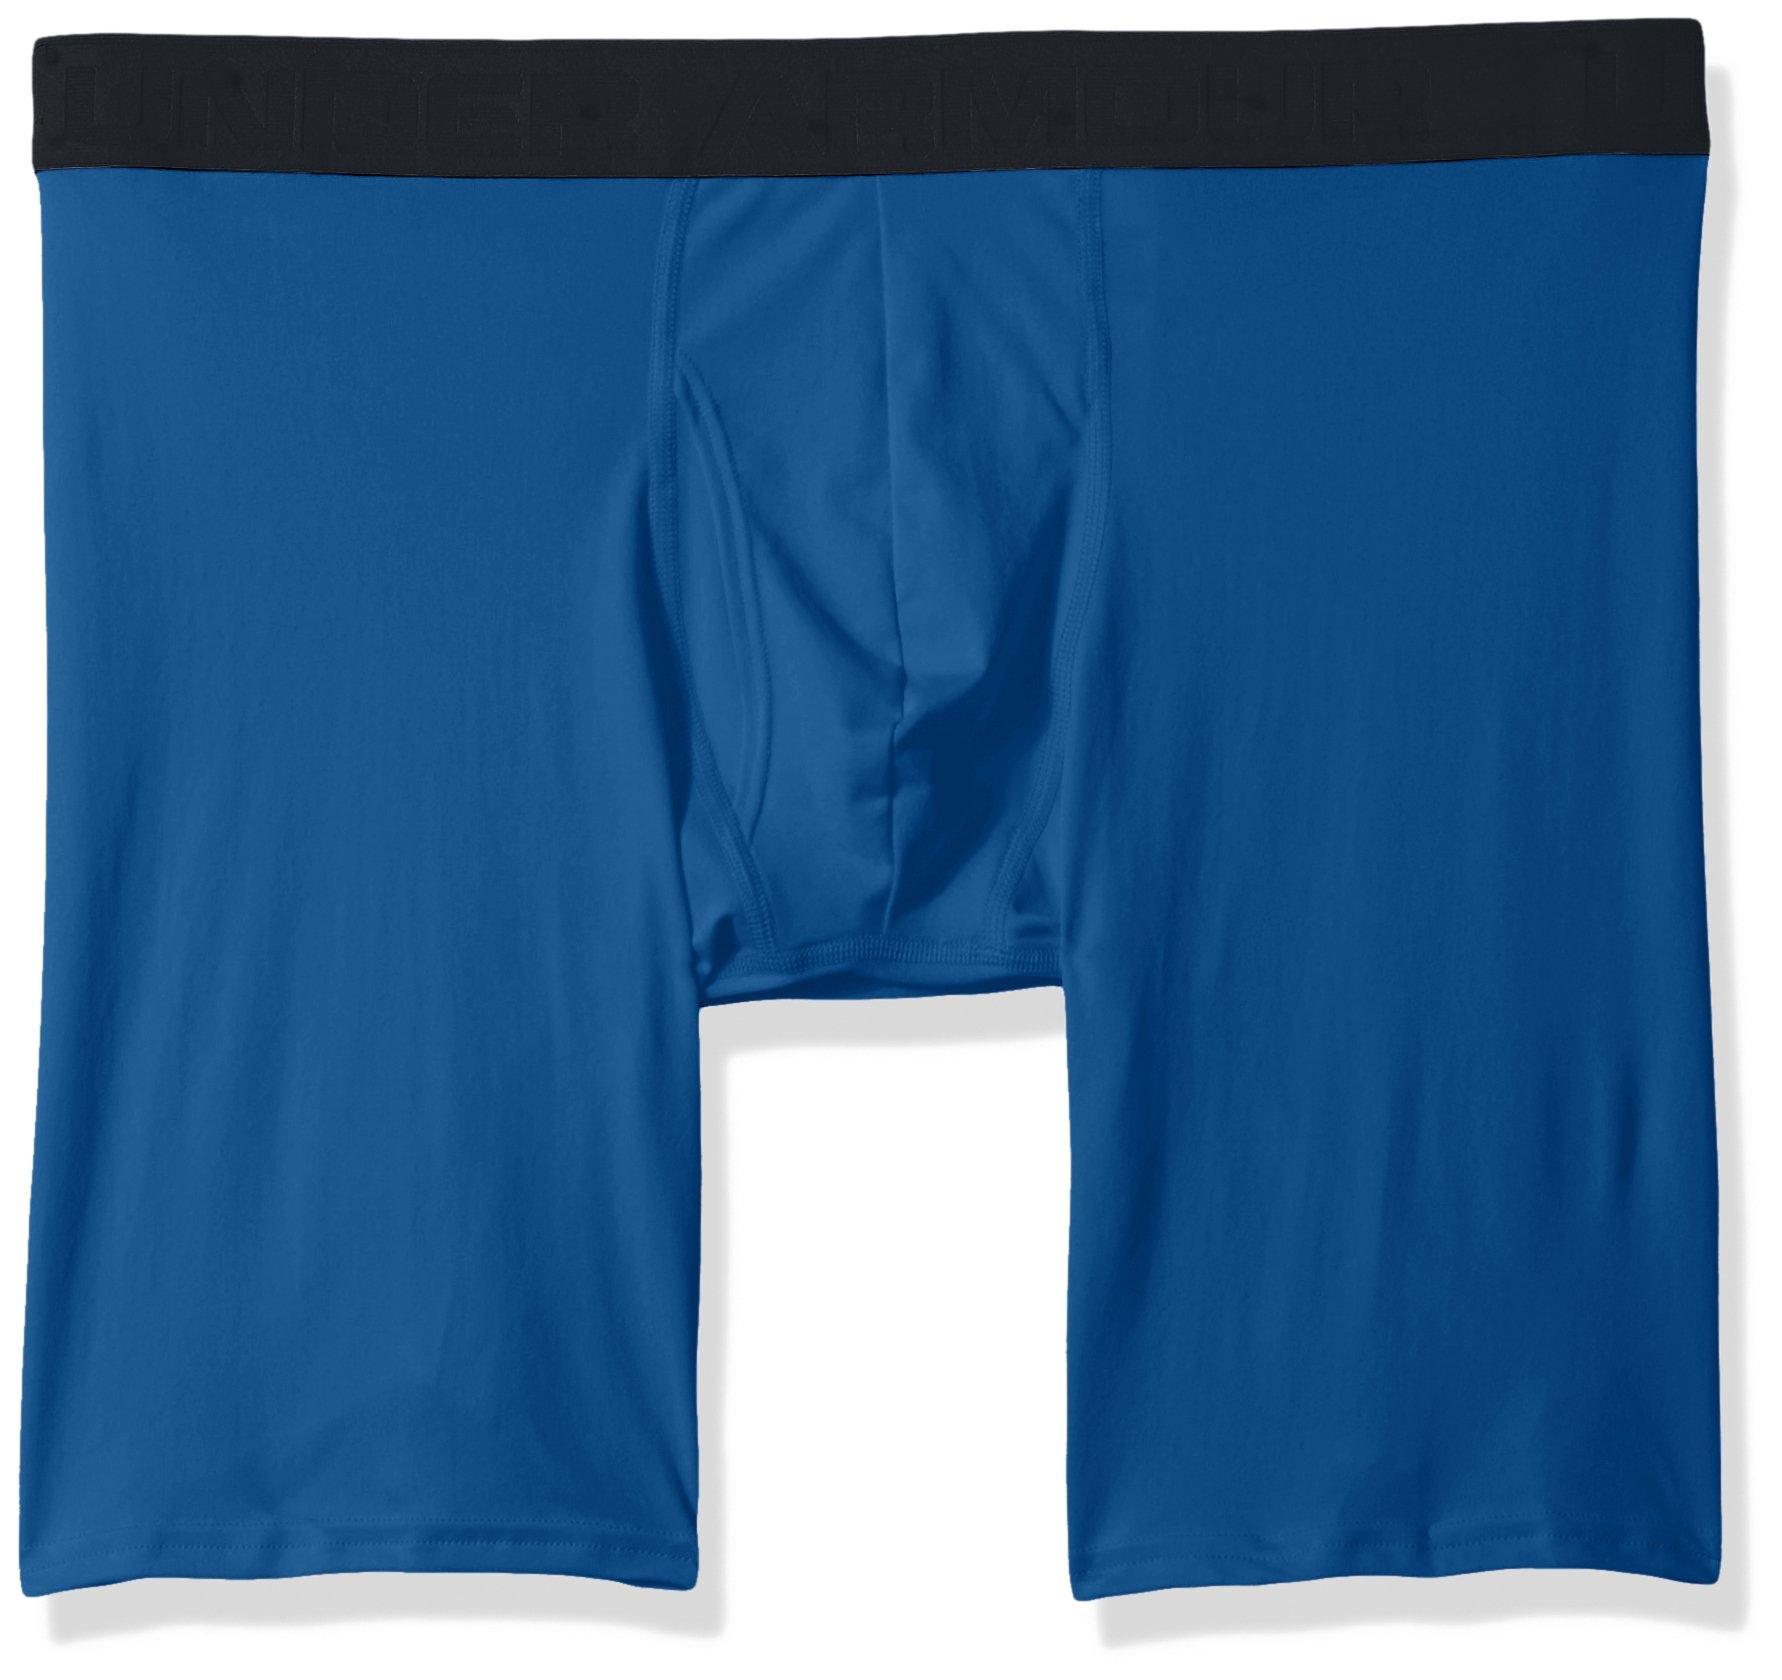 Under Armour Men's Threadborne 9'' Boxerjock, Moroccan Blue (487)/Black, X-Large